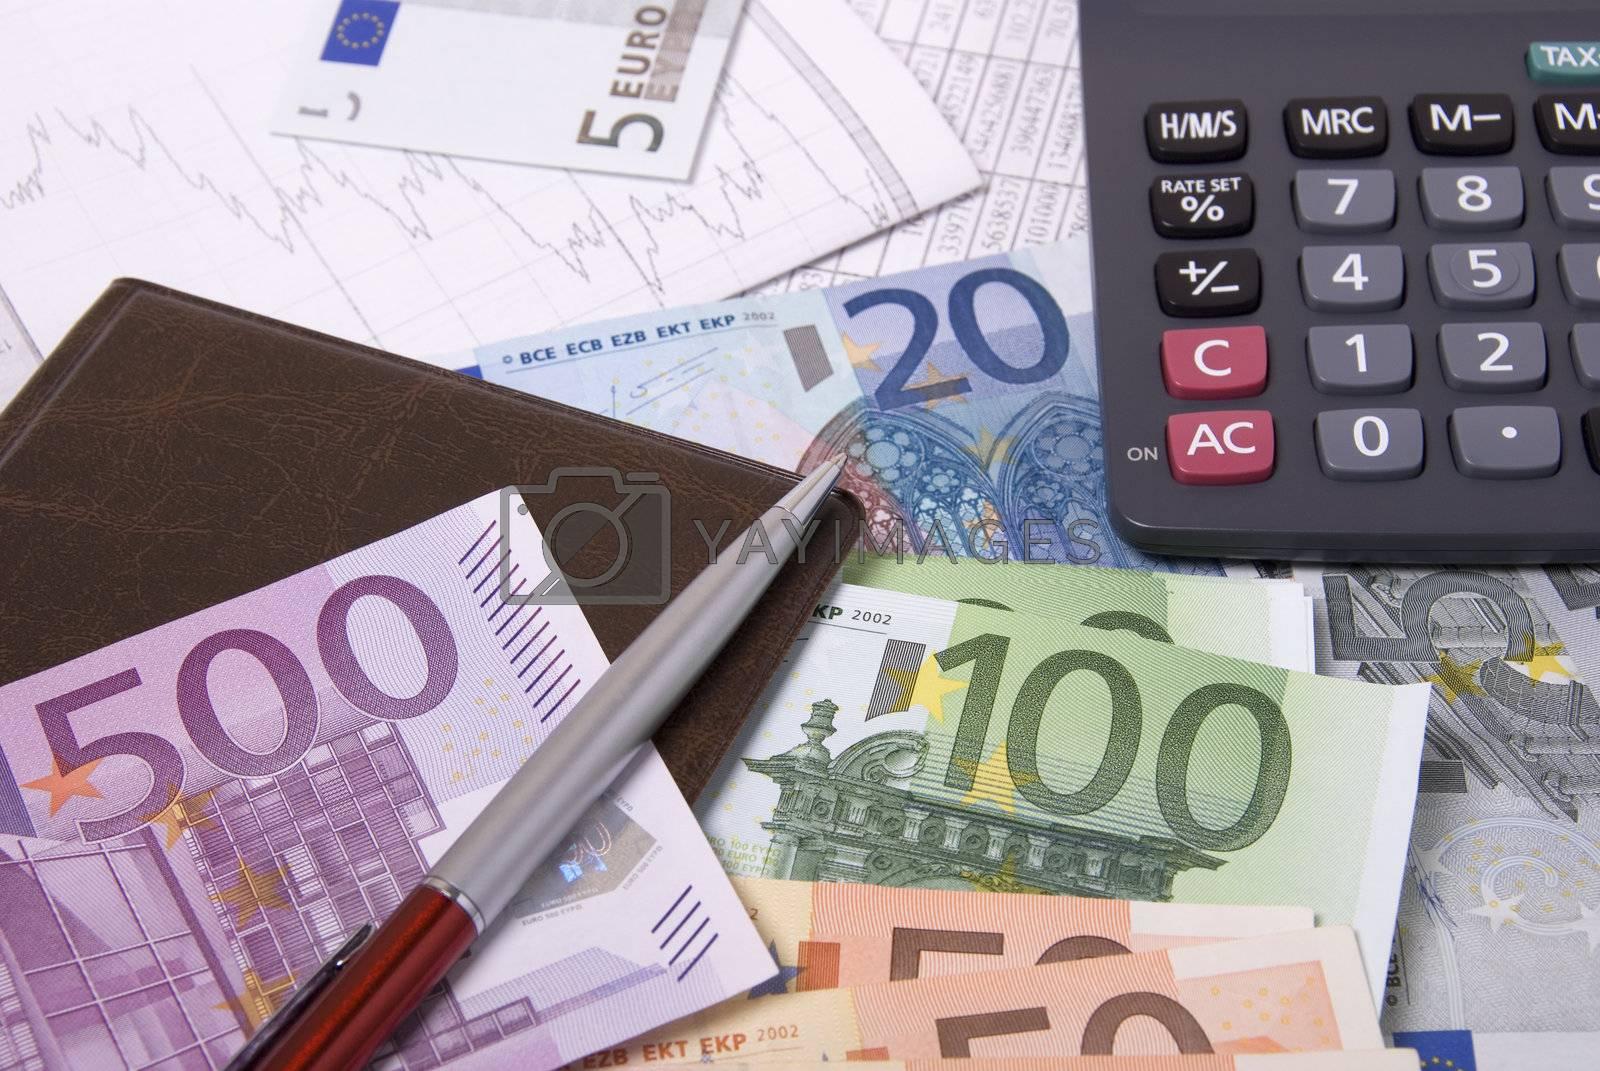 Paper money euro banknotes calculator and pen